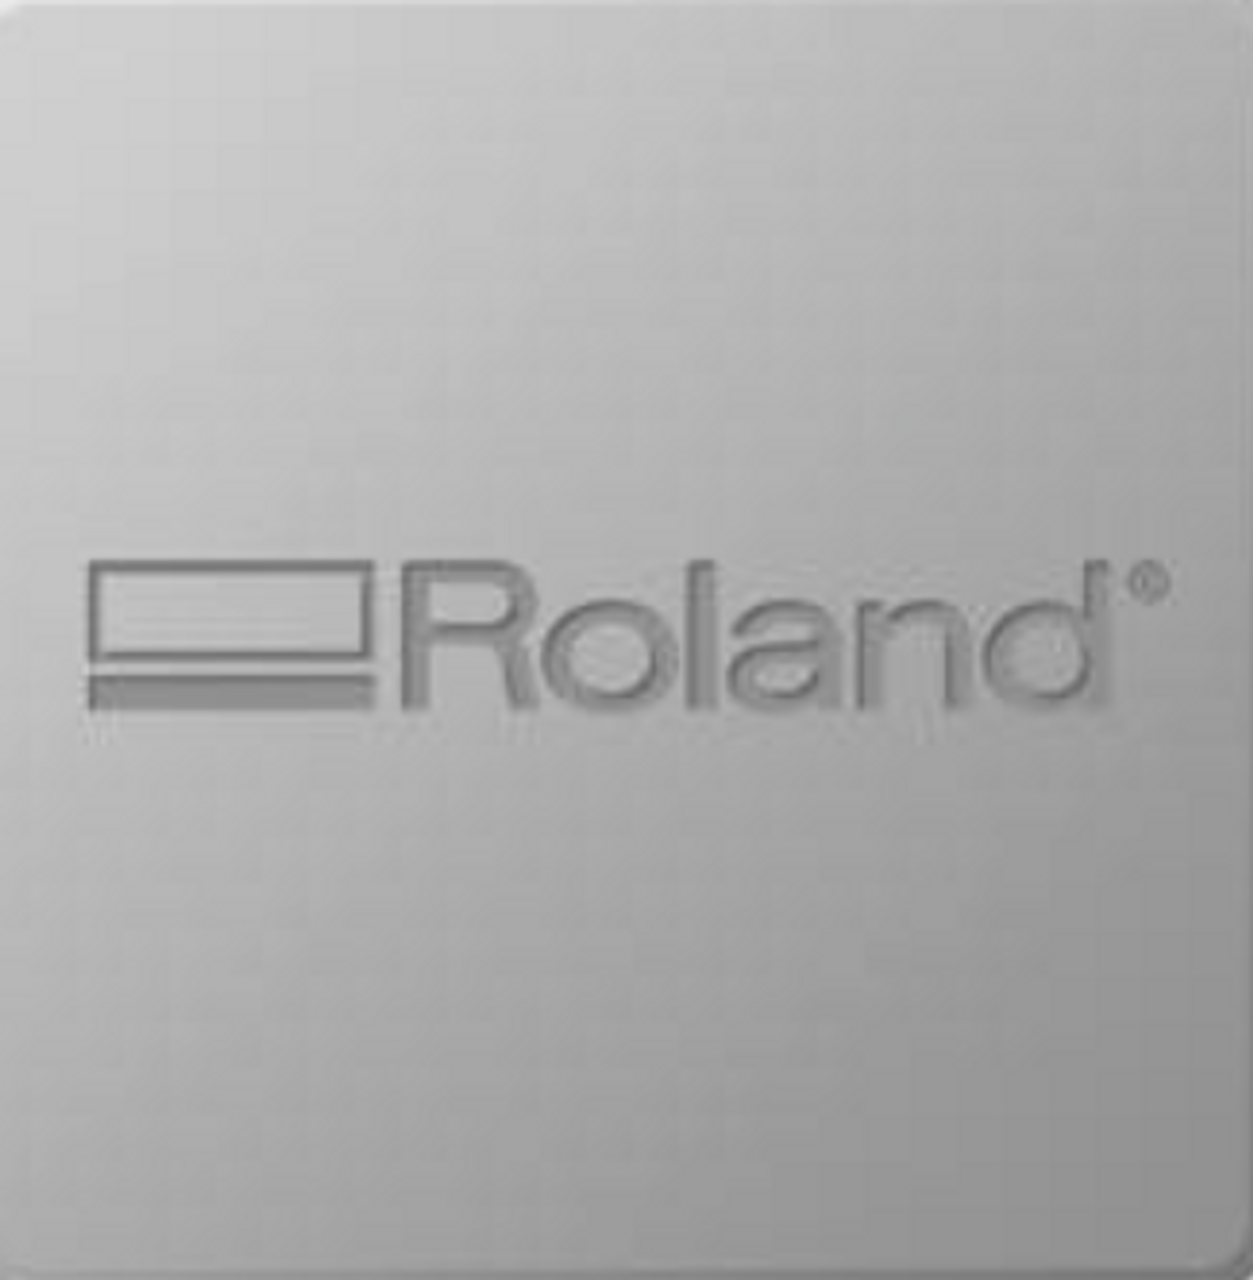 Roland pic shot